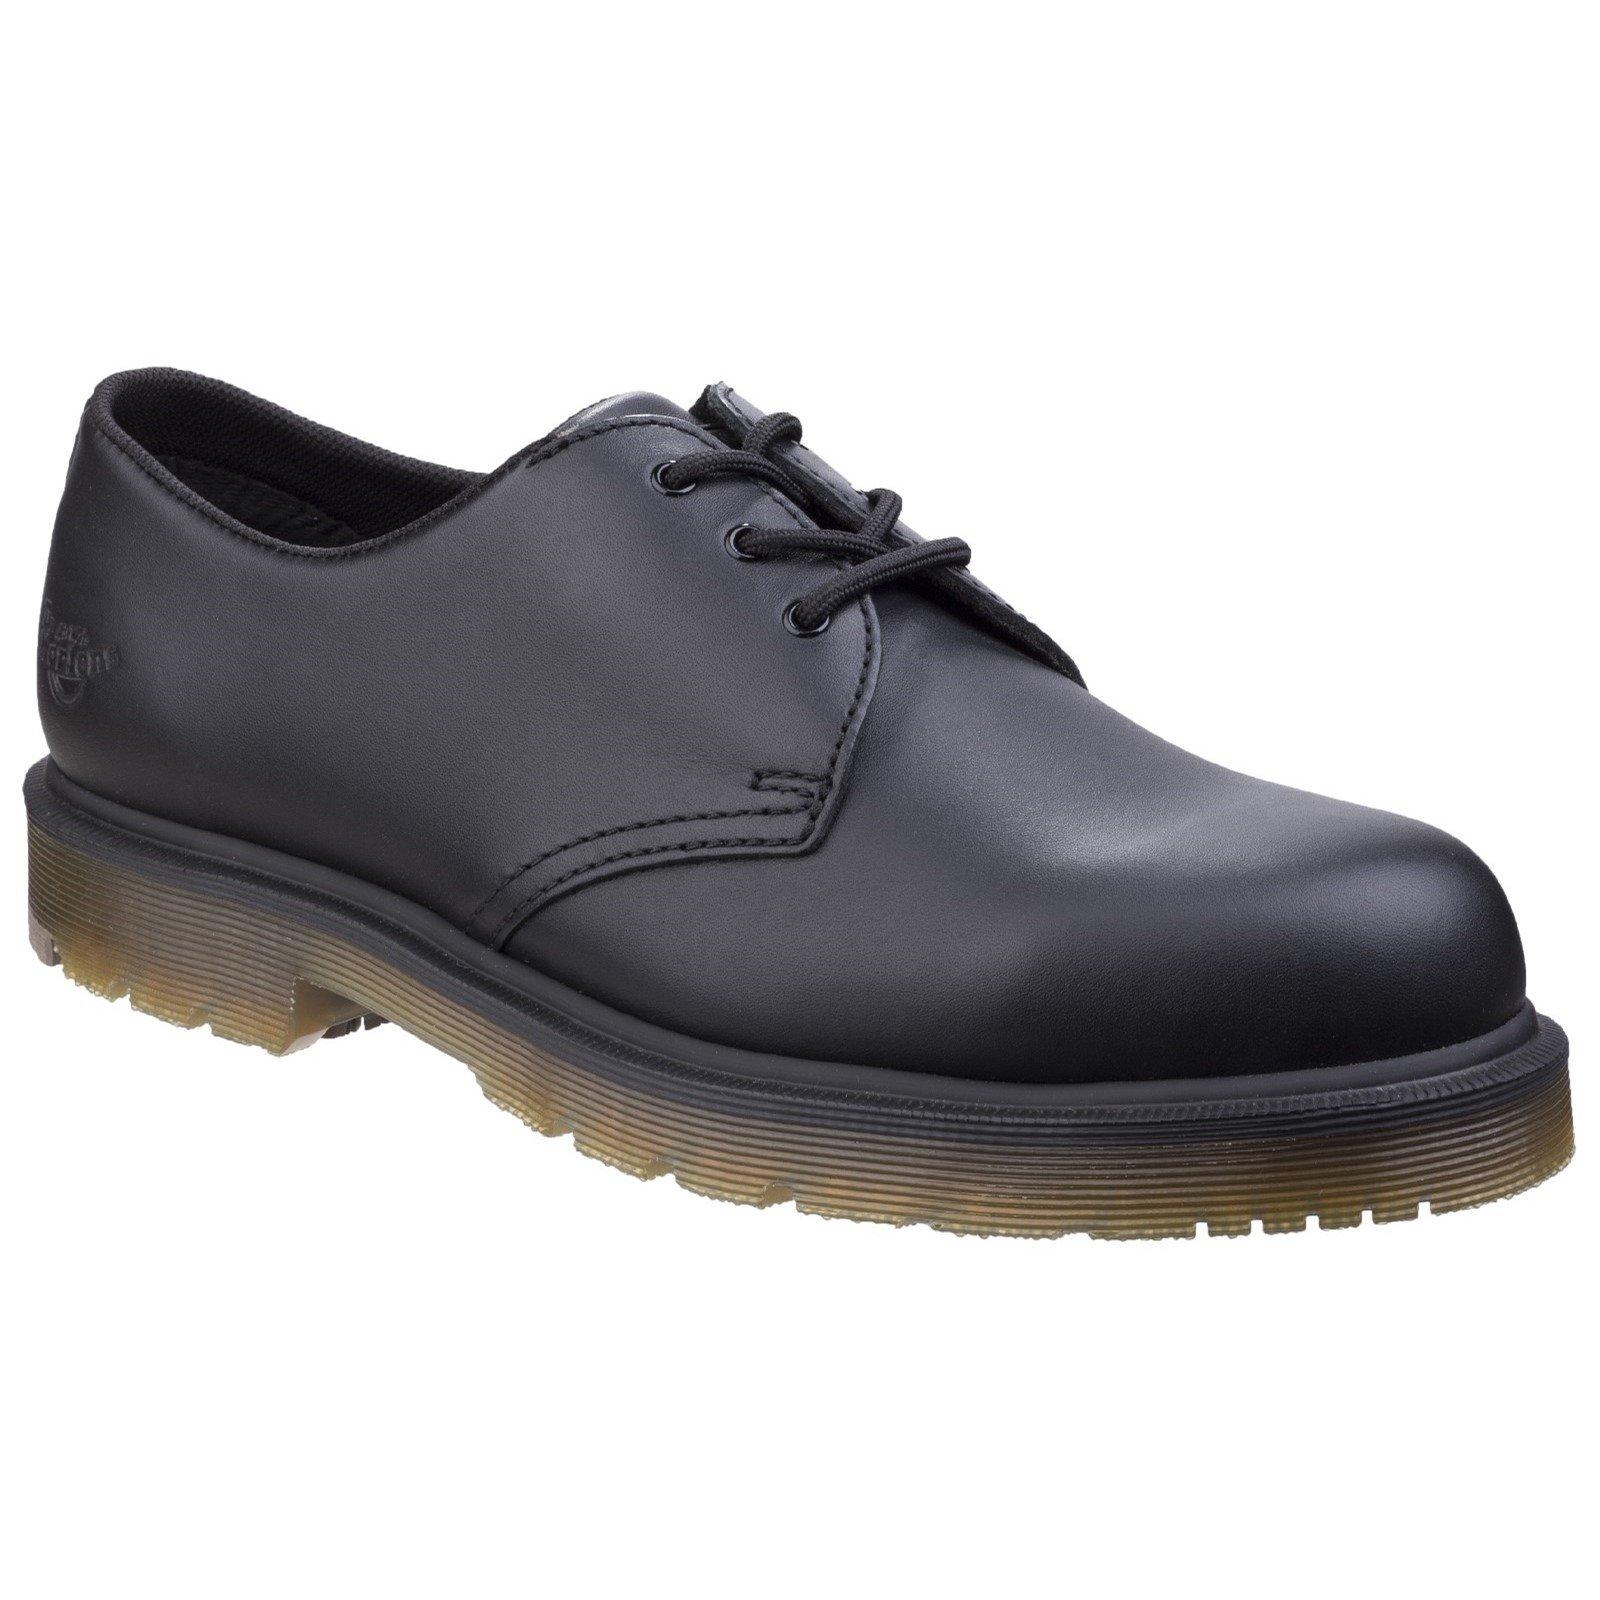 Dr Martens Men's Arlington NS Derby Shoe Black 26781 - Black Industrial Full Grain 10